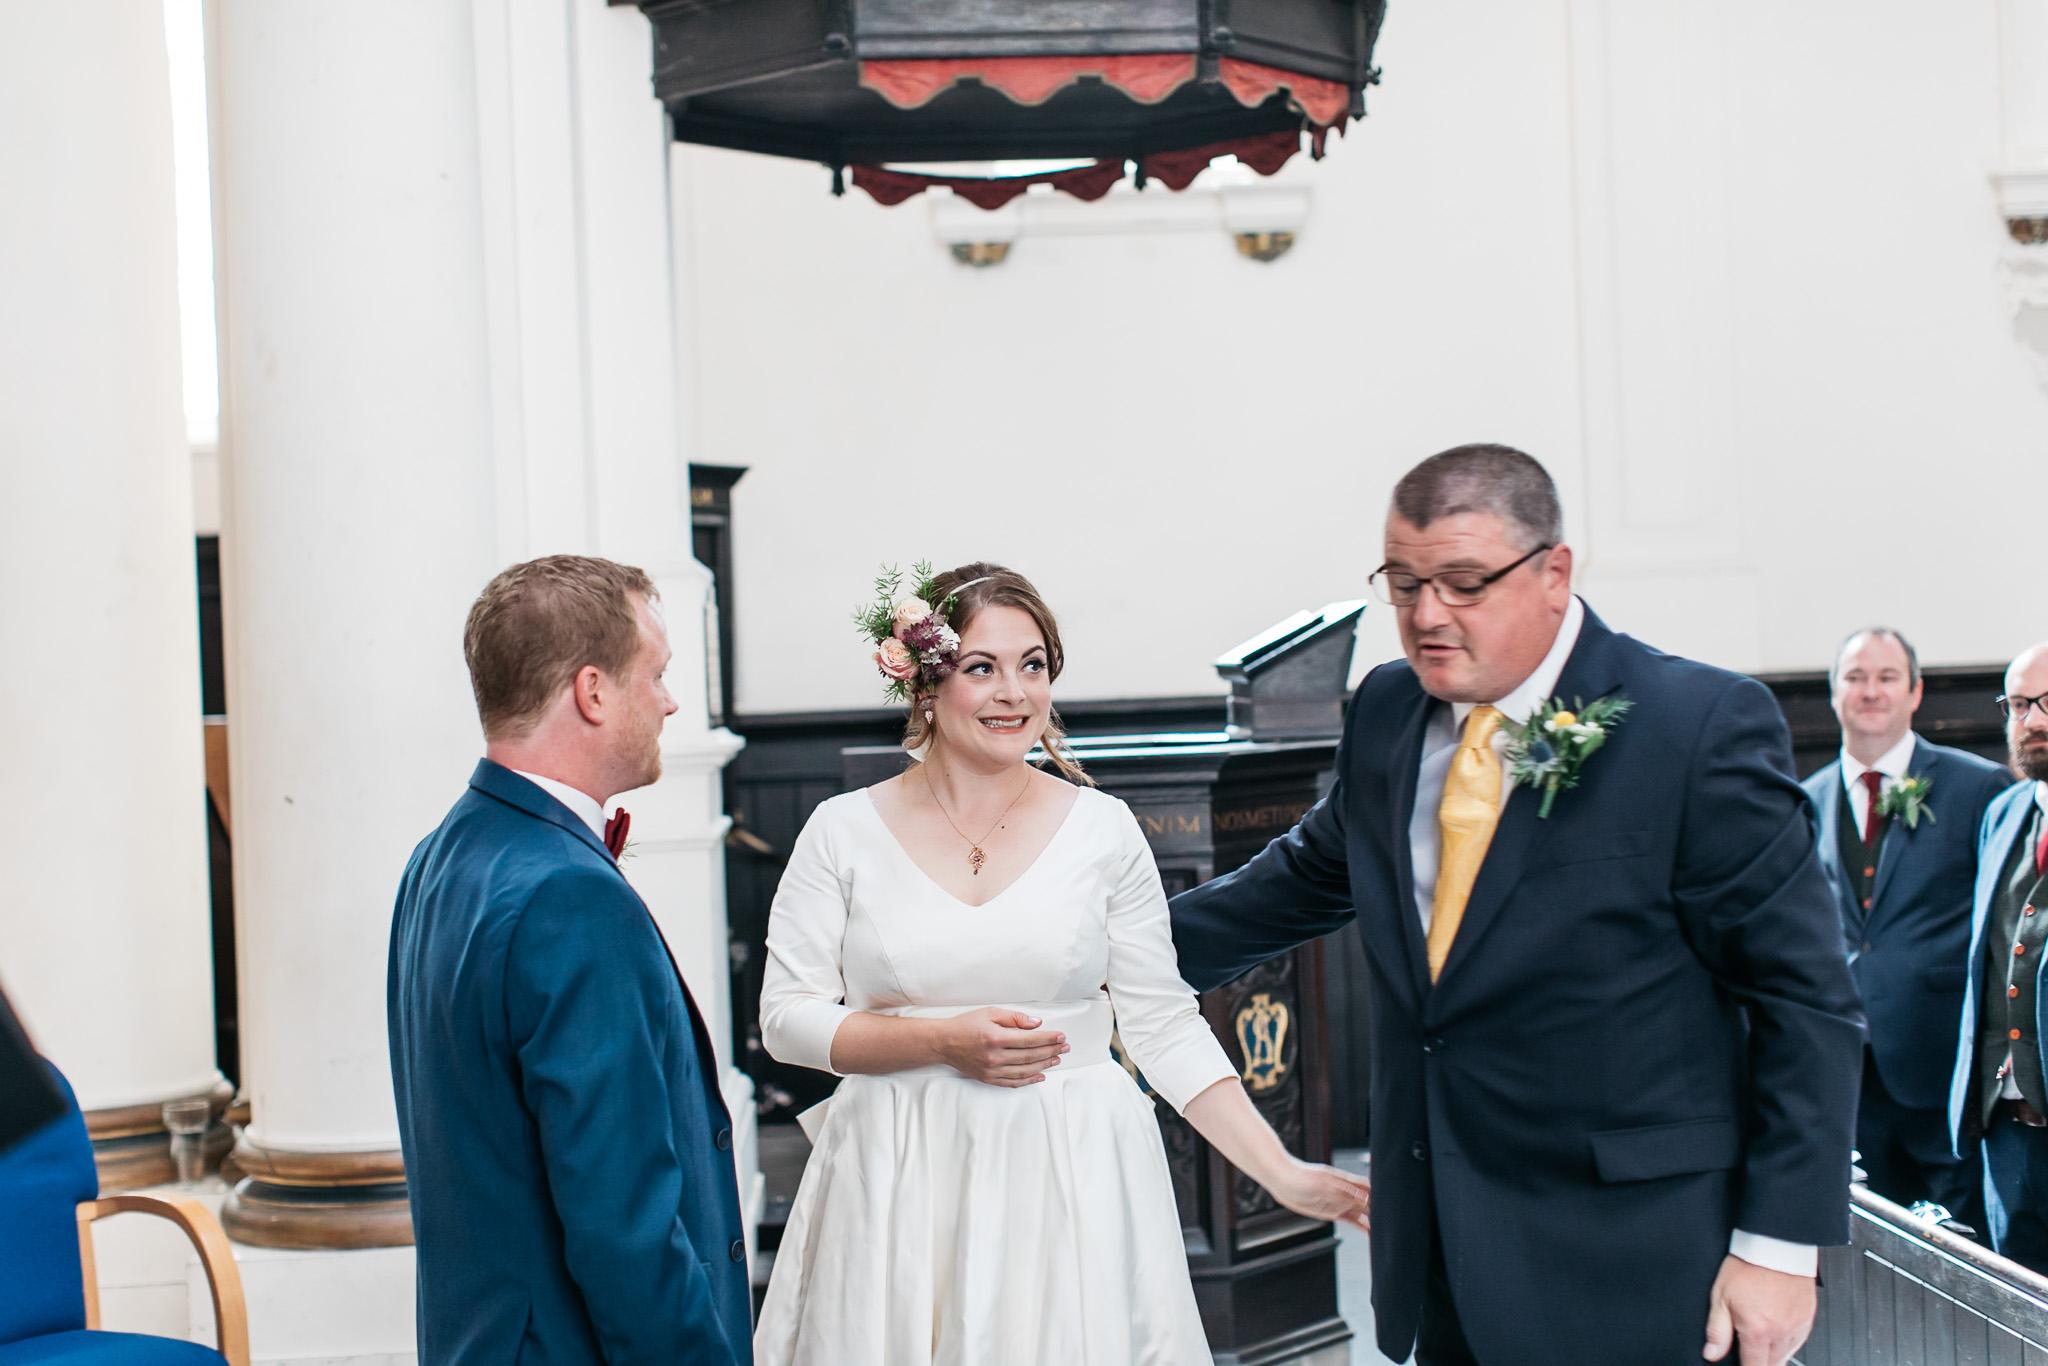 st_andrews_fabrica_brighton_wedding_551.jpg